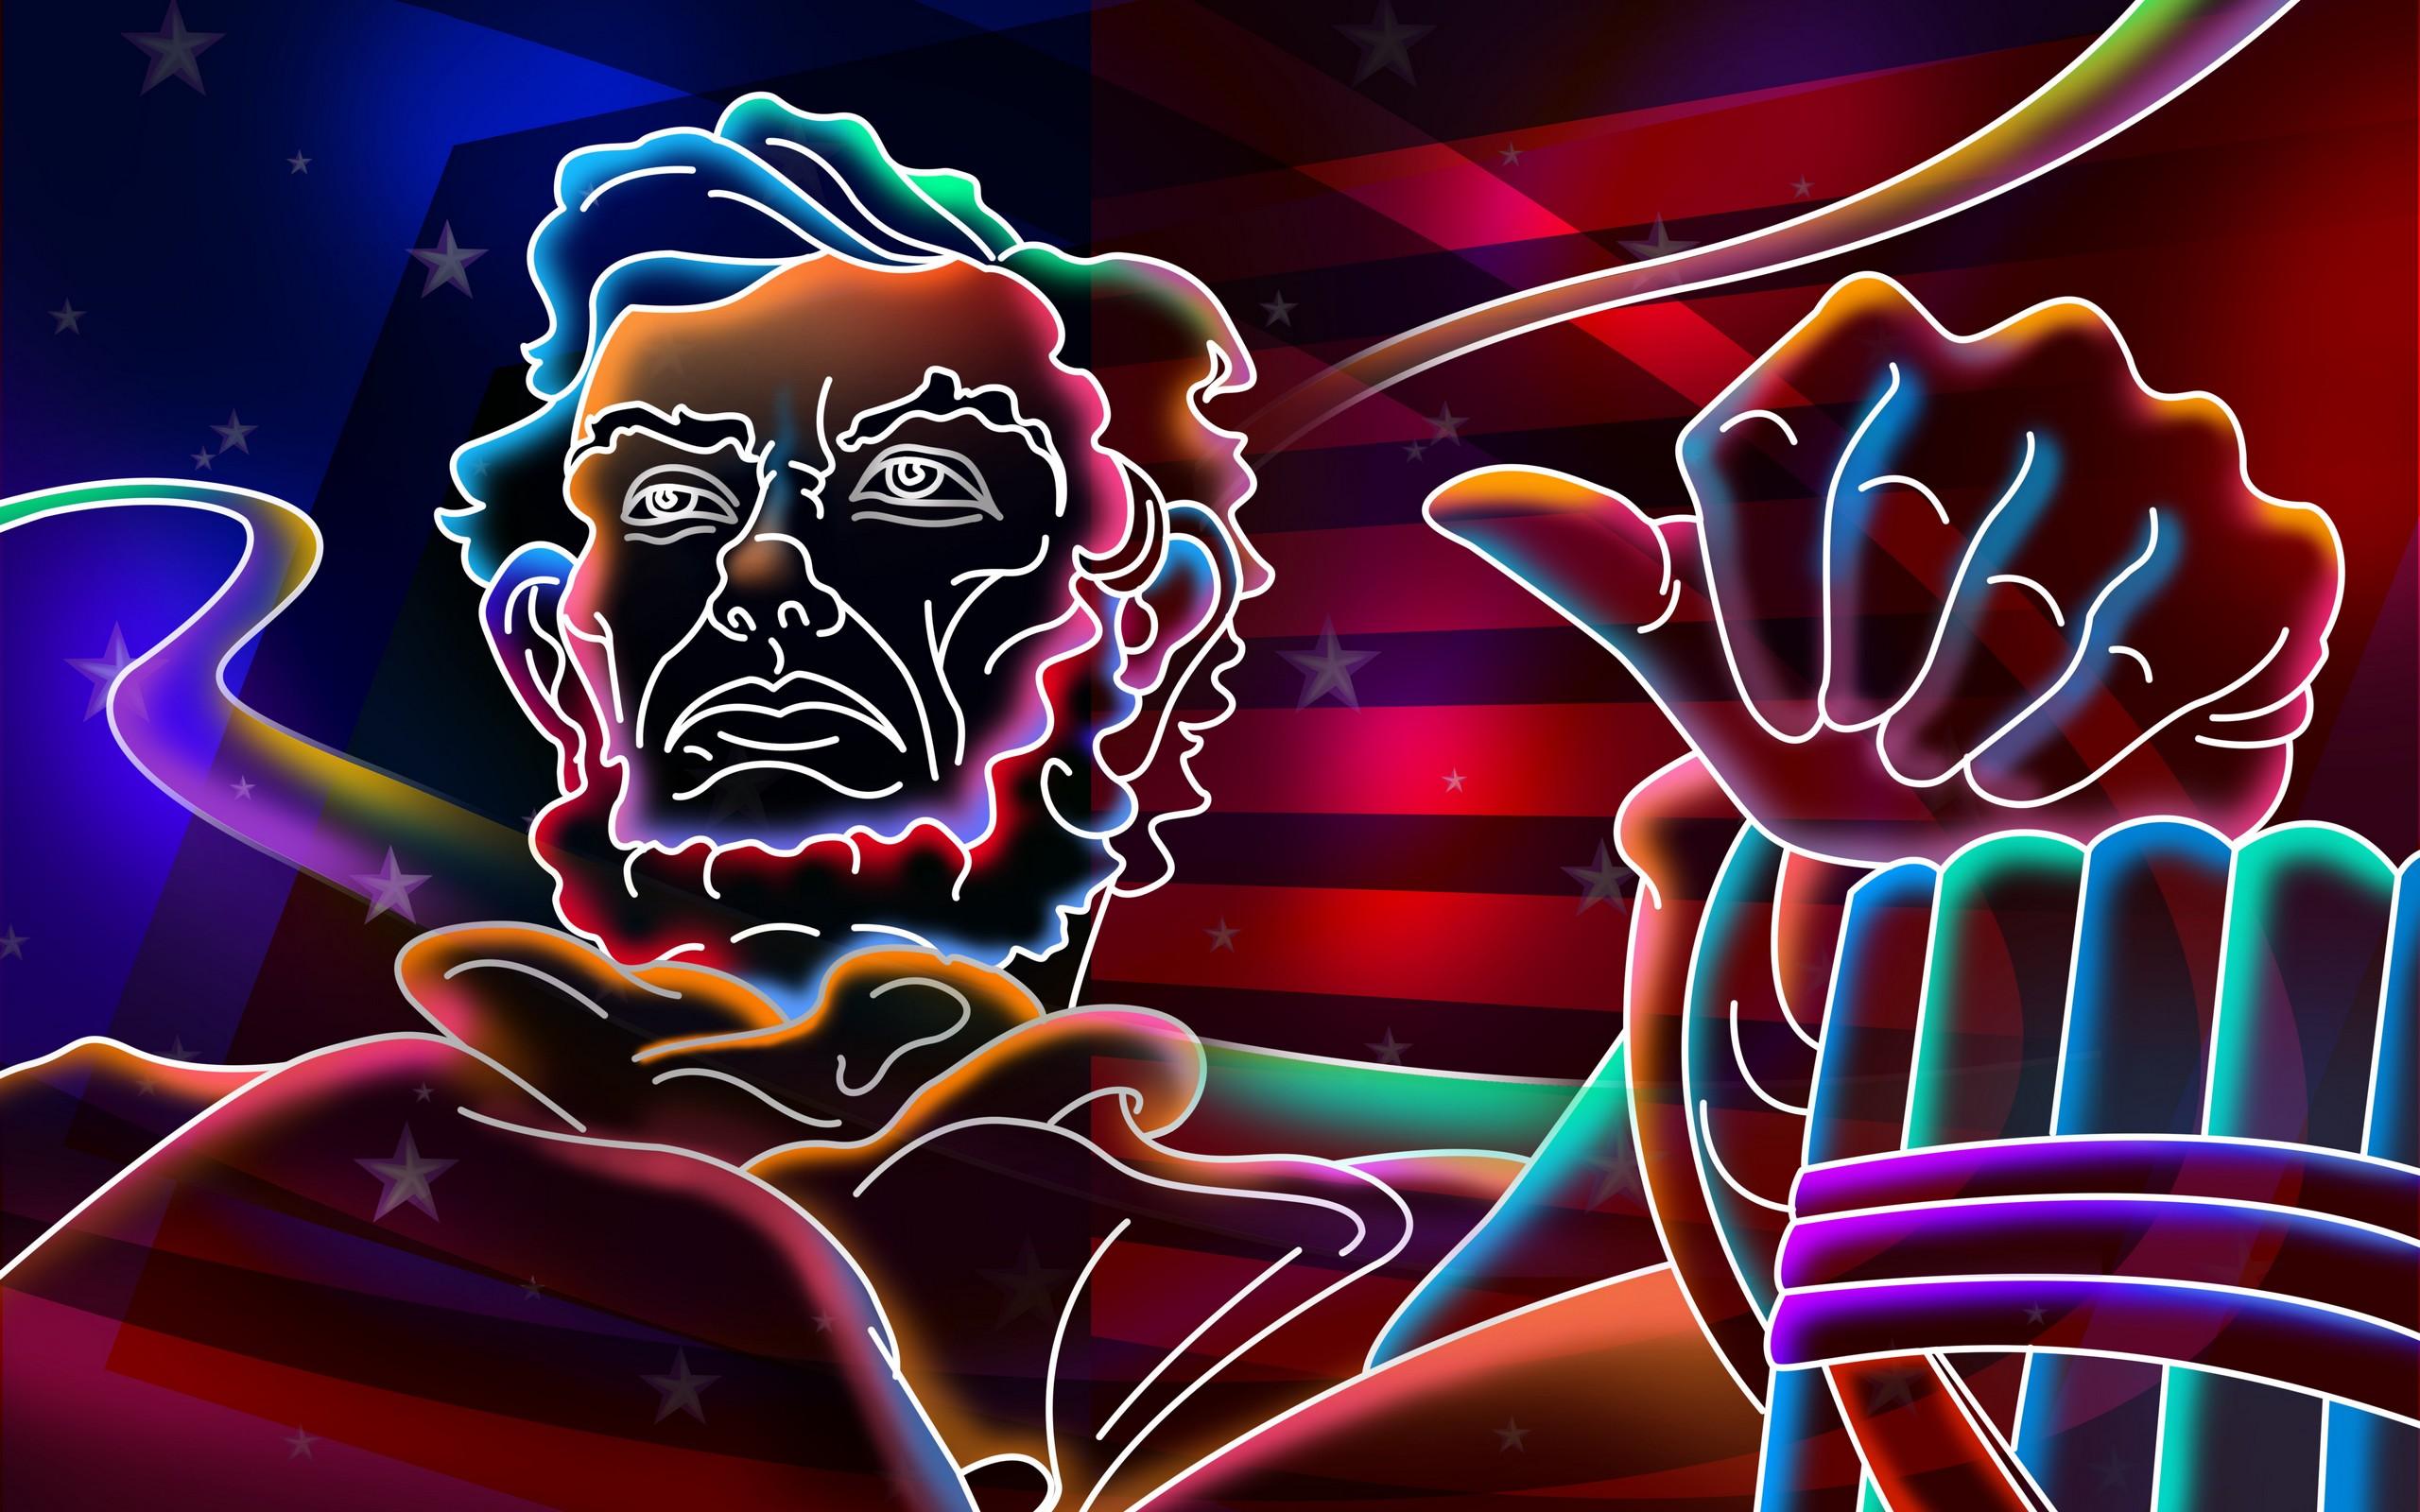 Abe Lincoln frees the raves Papel de Parede HD Plano de